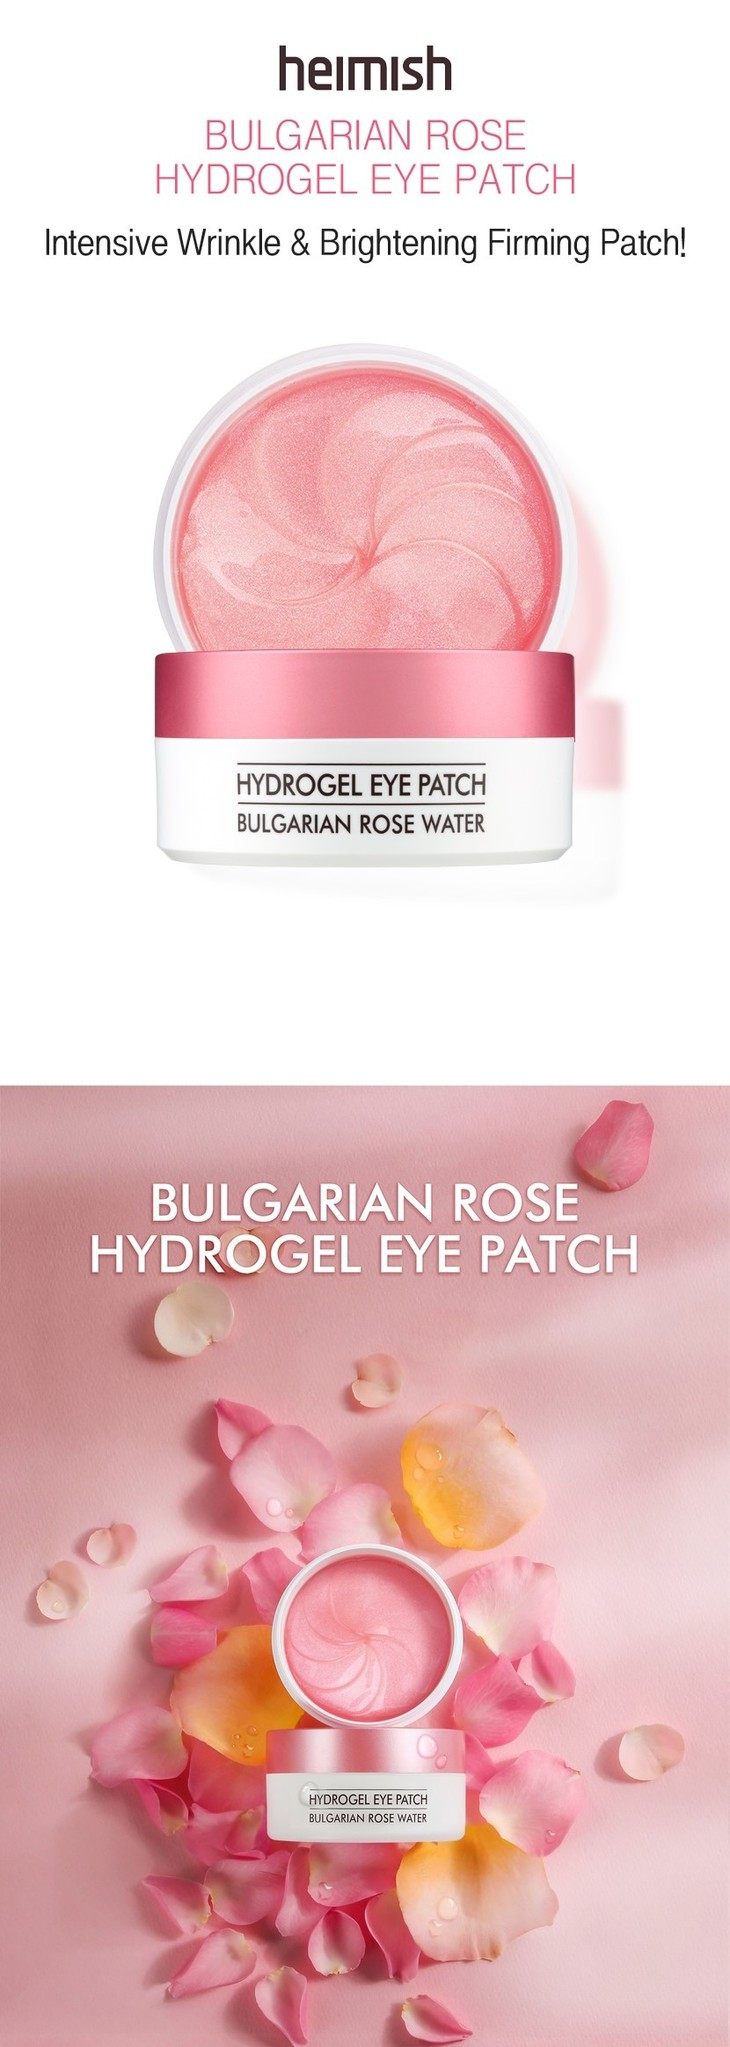 Bulgarian Rose Water Hydrogel Eye Patch-2